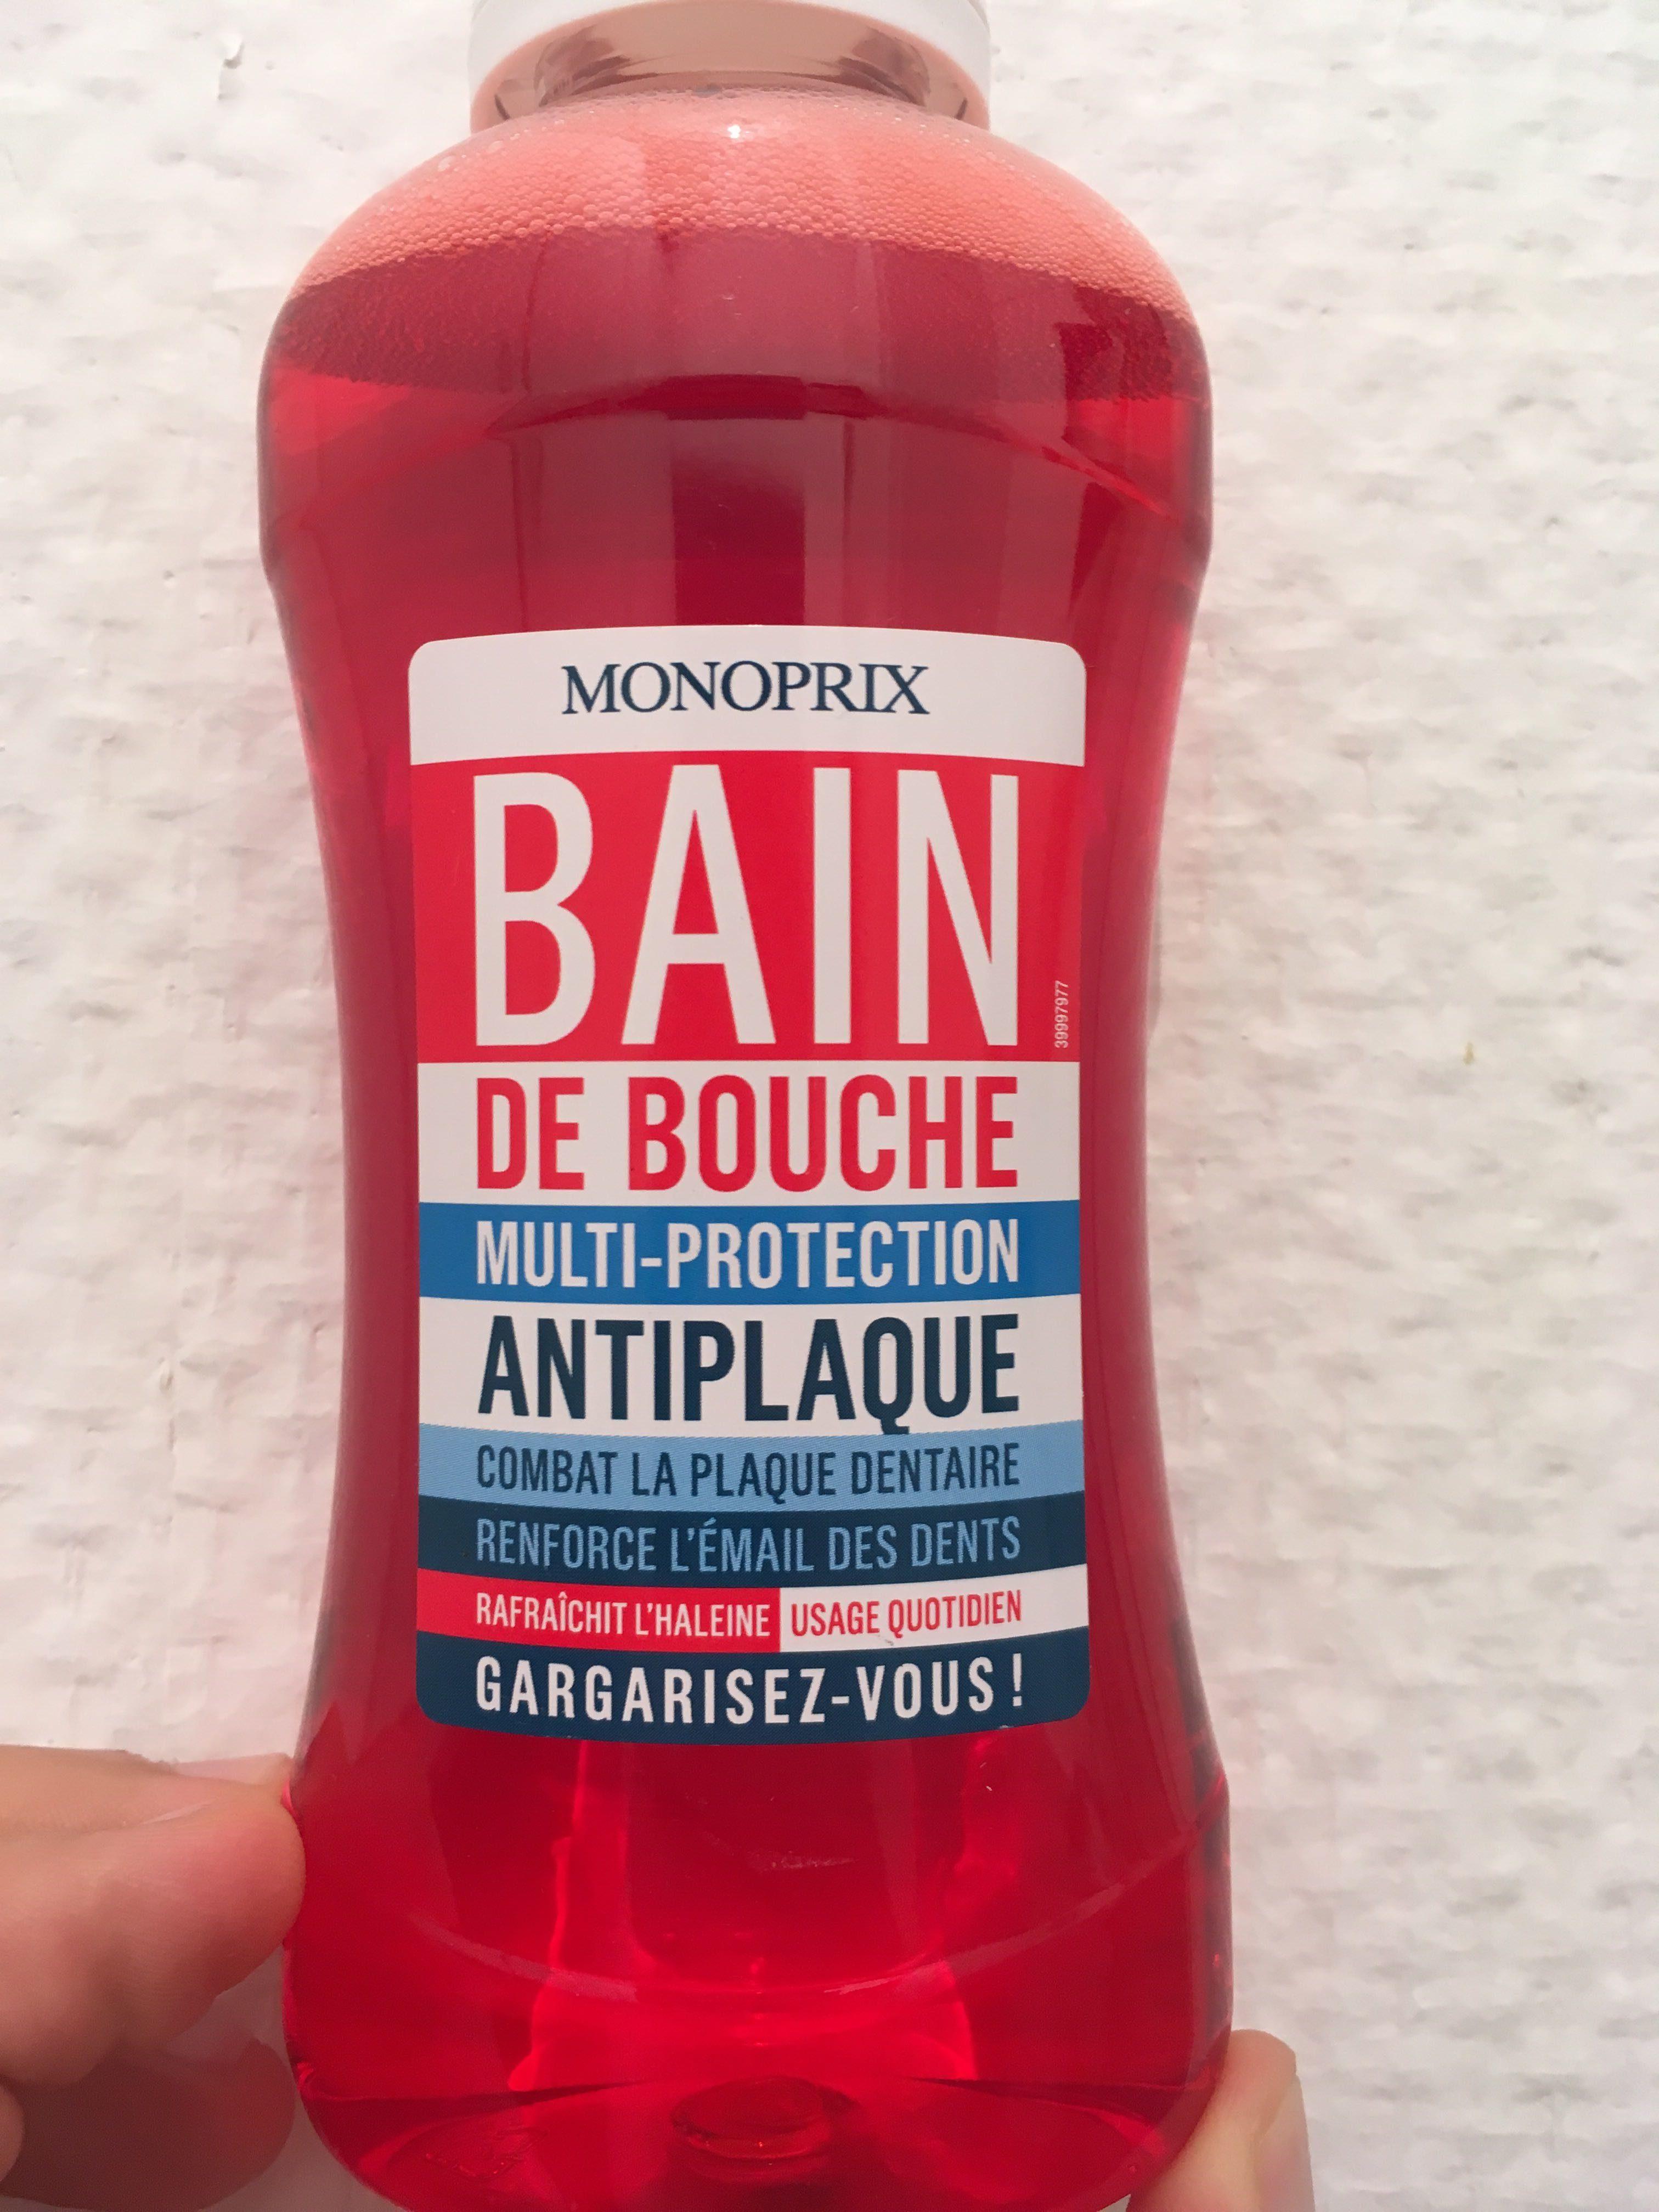 Bain de bouche Antiplaque - Product - fr